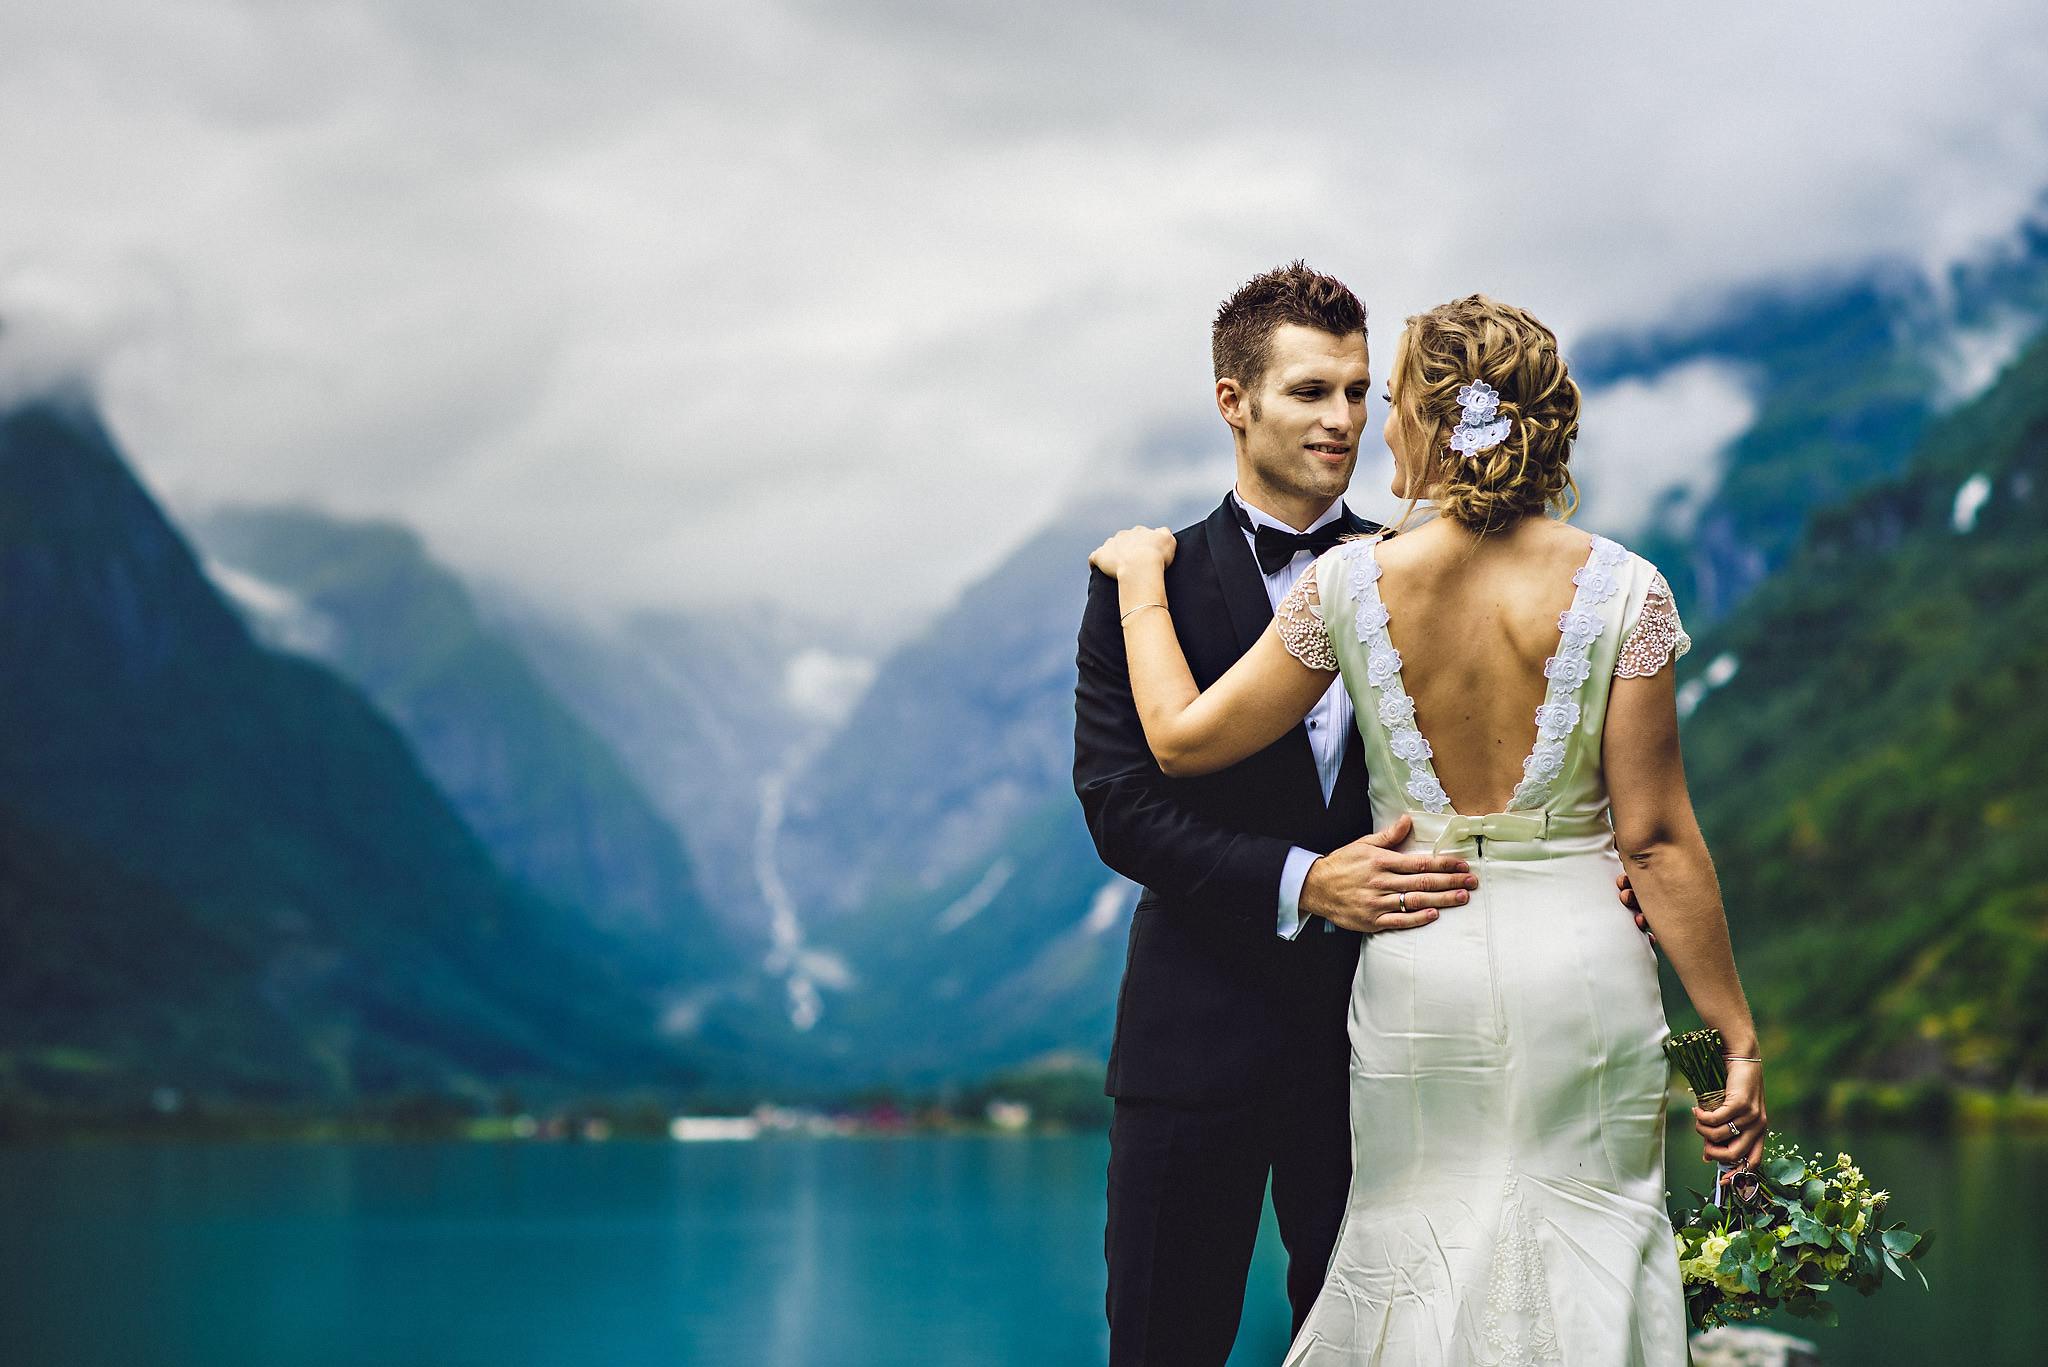 Bryllup på Yrineset i Oldedalen bryllupsfotograf sogn og fjordane-43.jpg